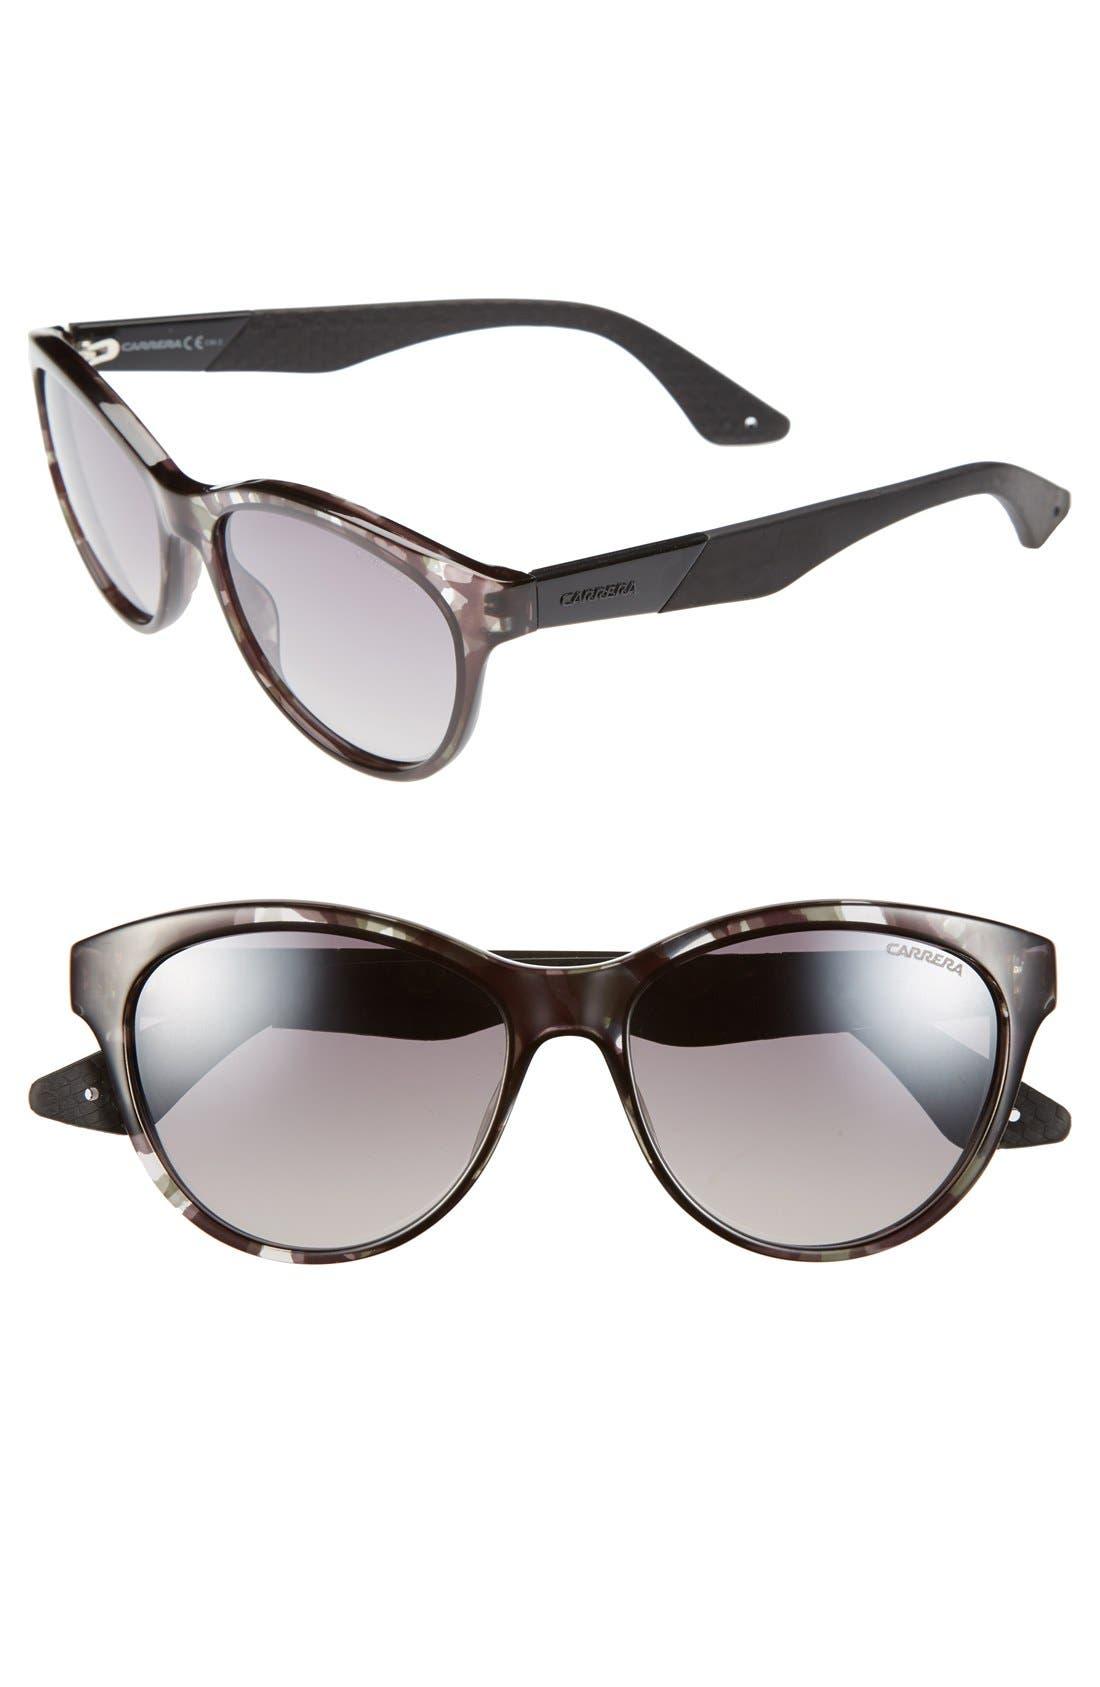 Alternate Image 1 Selected - Carrera Eyewear 54mm Retro Sunglasses